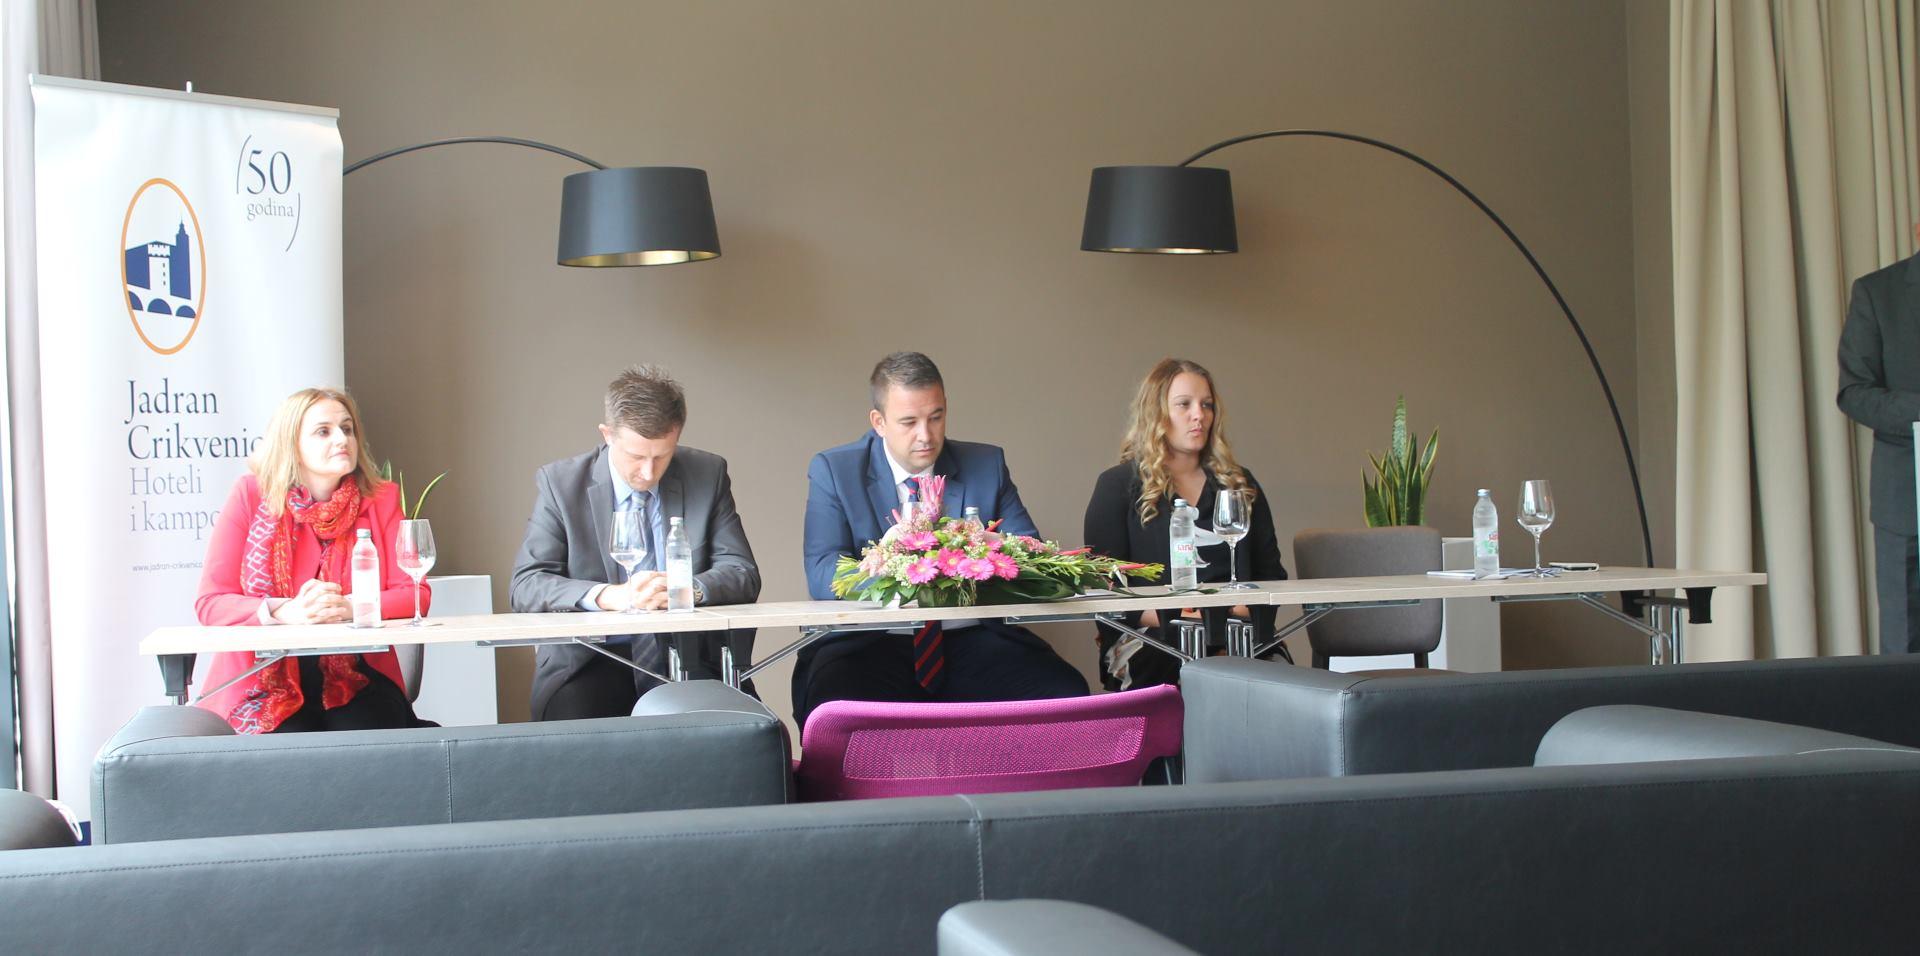 Prestižni halal certifikat krasi crikveničke hotele Katarina, Omorika i Esplanade